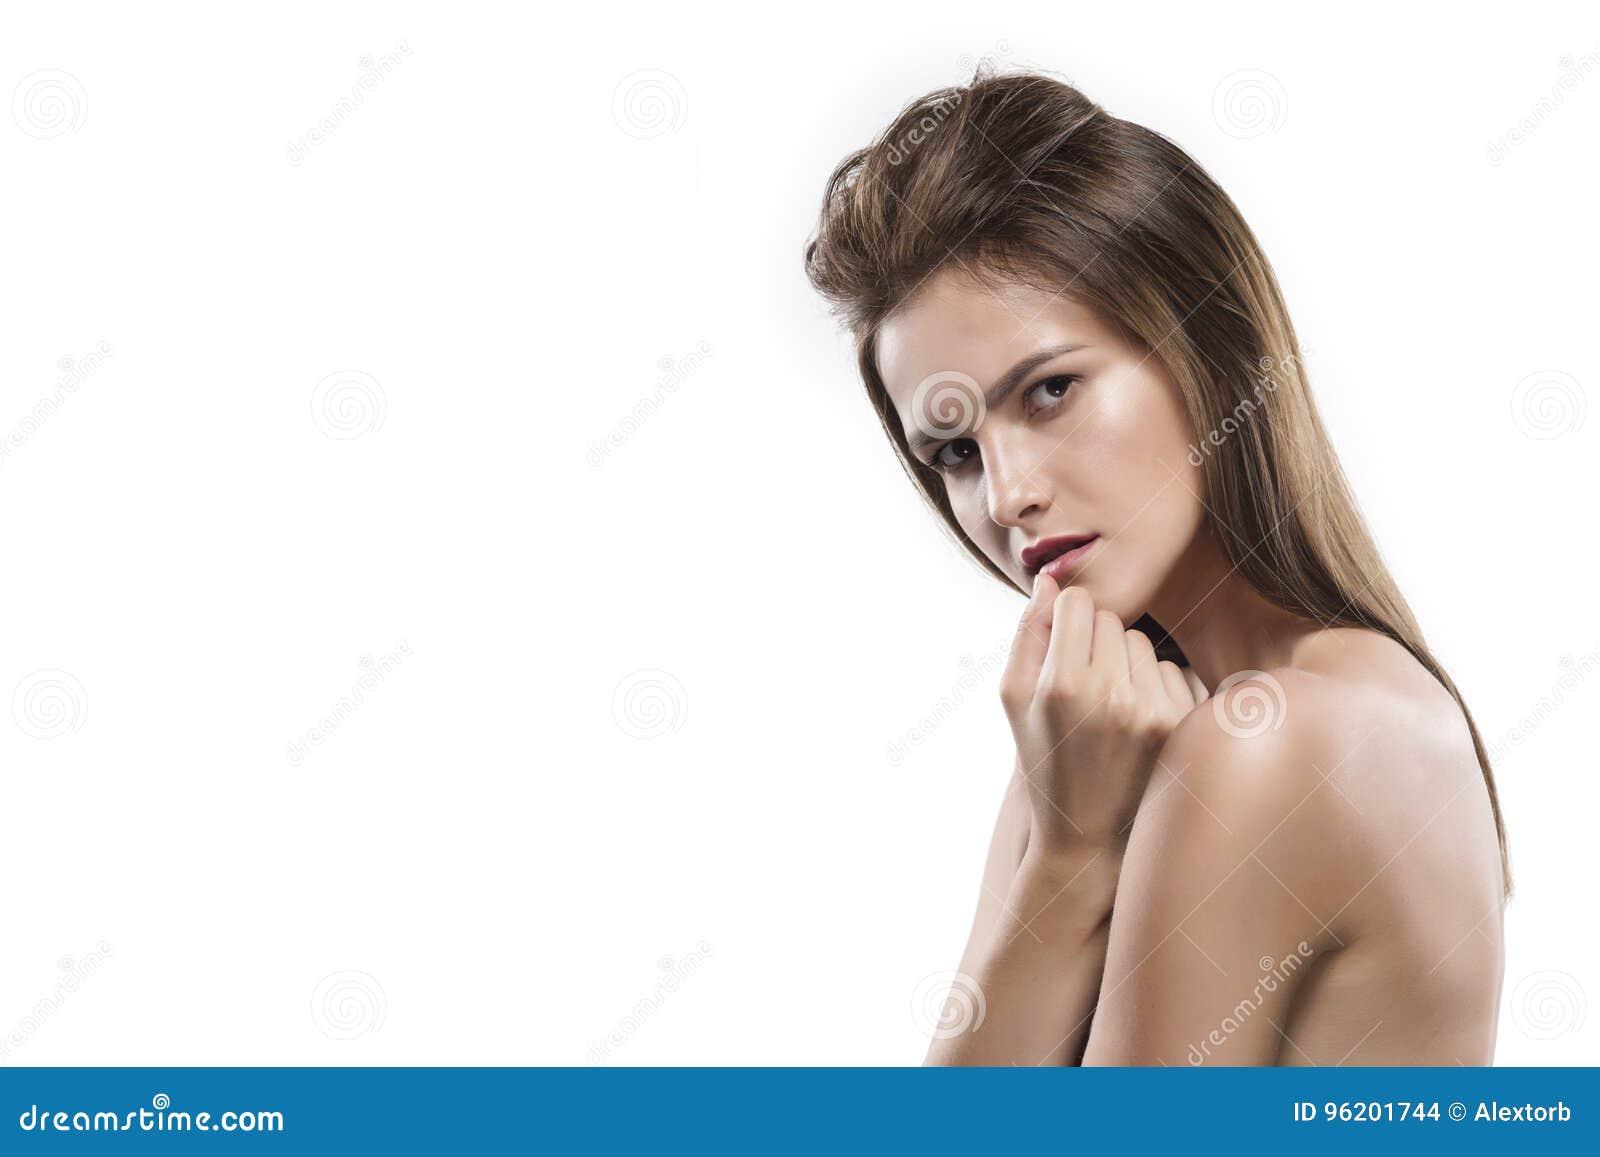 Potrtrait της νέας γυναίκας που απομονώνεται στο λευκό